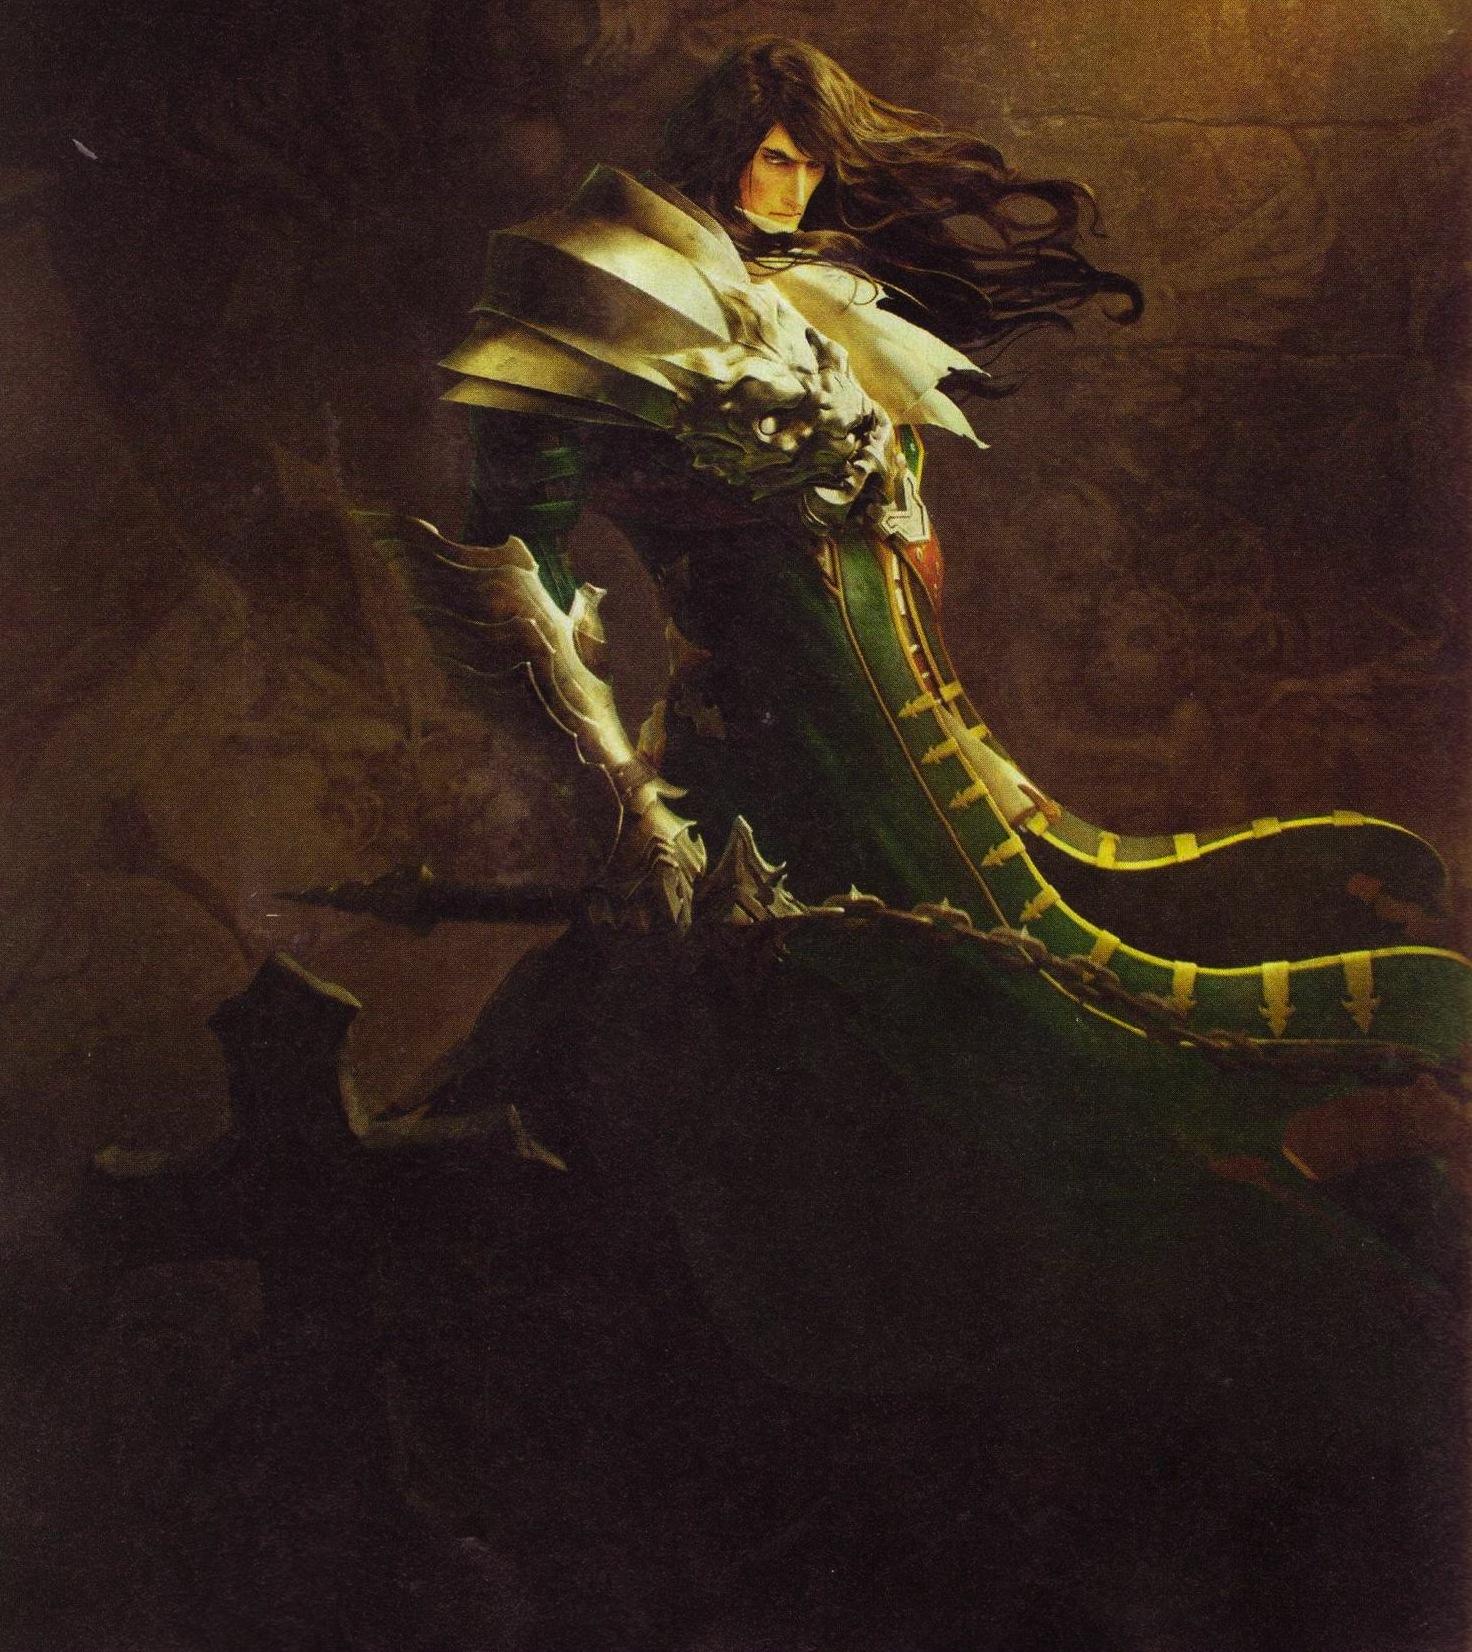 Castlevania-LordsofShadow-MirrorofFate 3DS Div 003